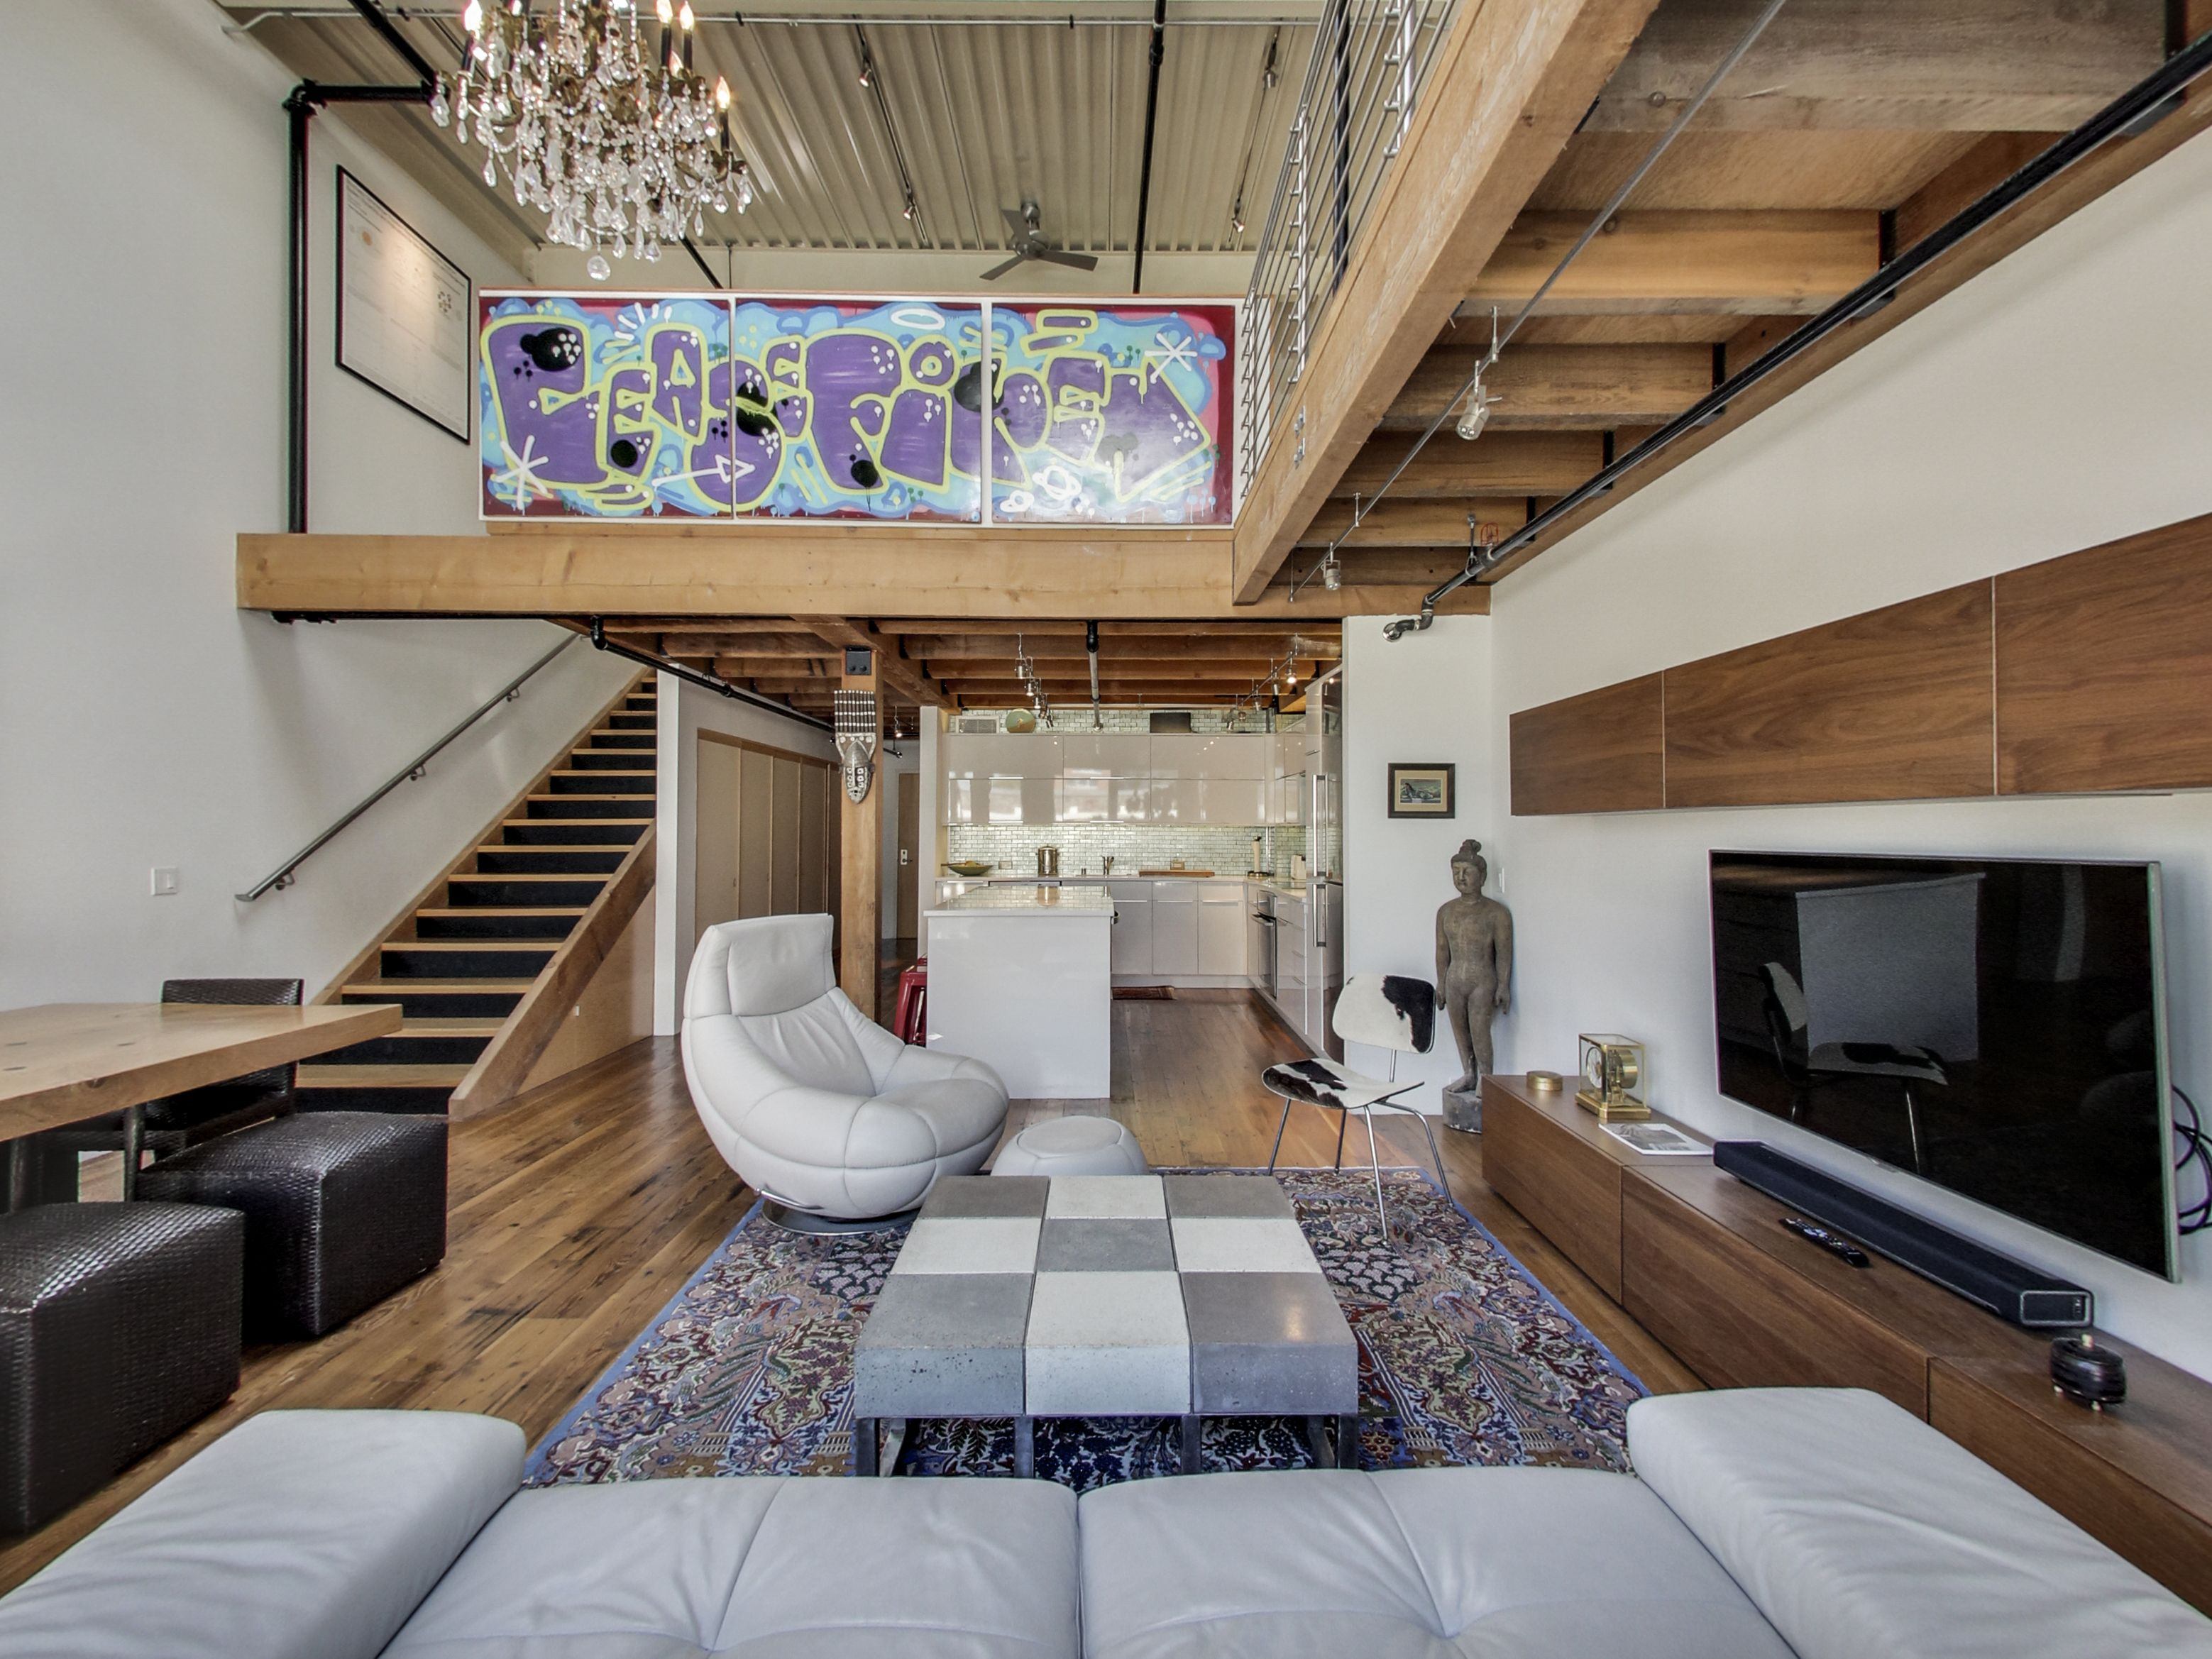 New Best Flooring for Beach Condo